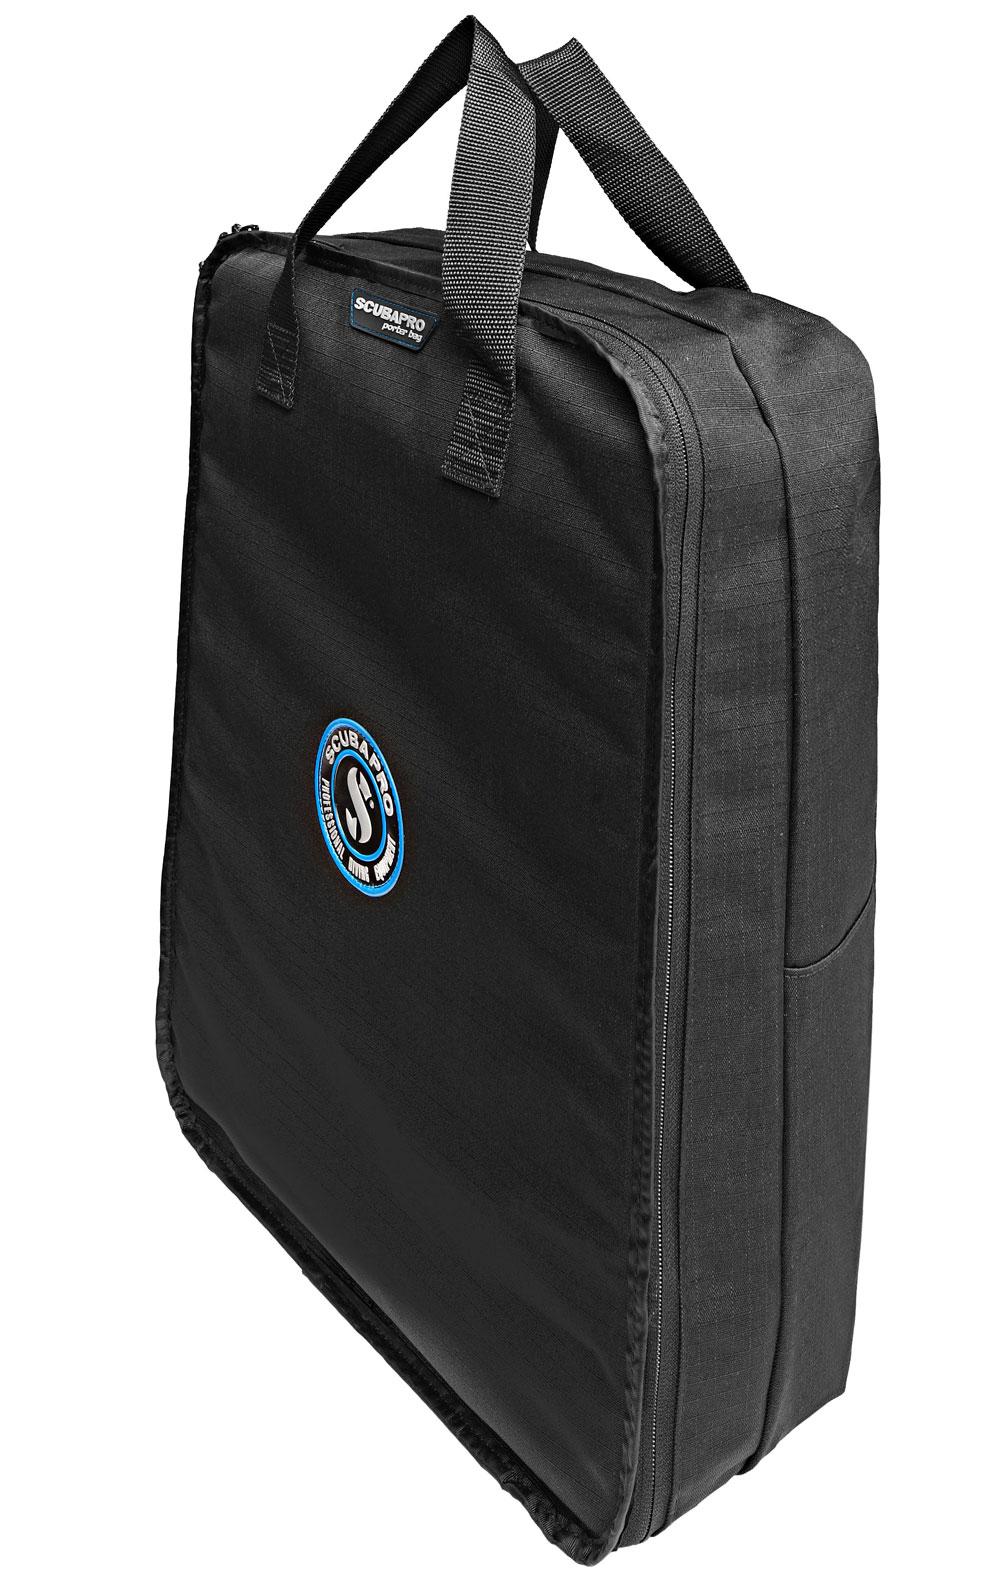 Scubapro porter bag vancouver diving locker for Dive gear bag